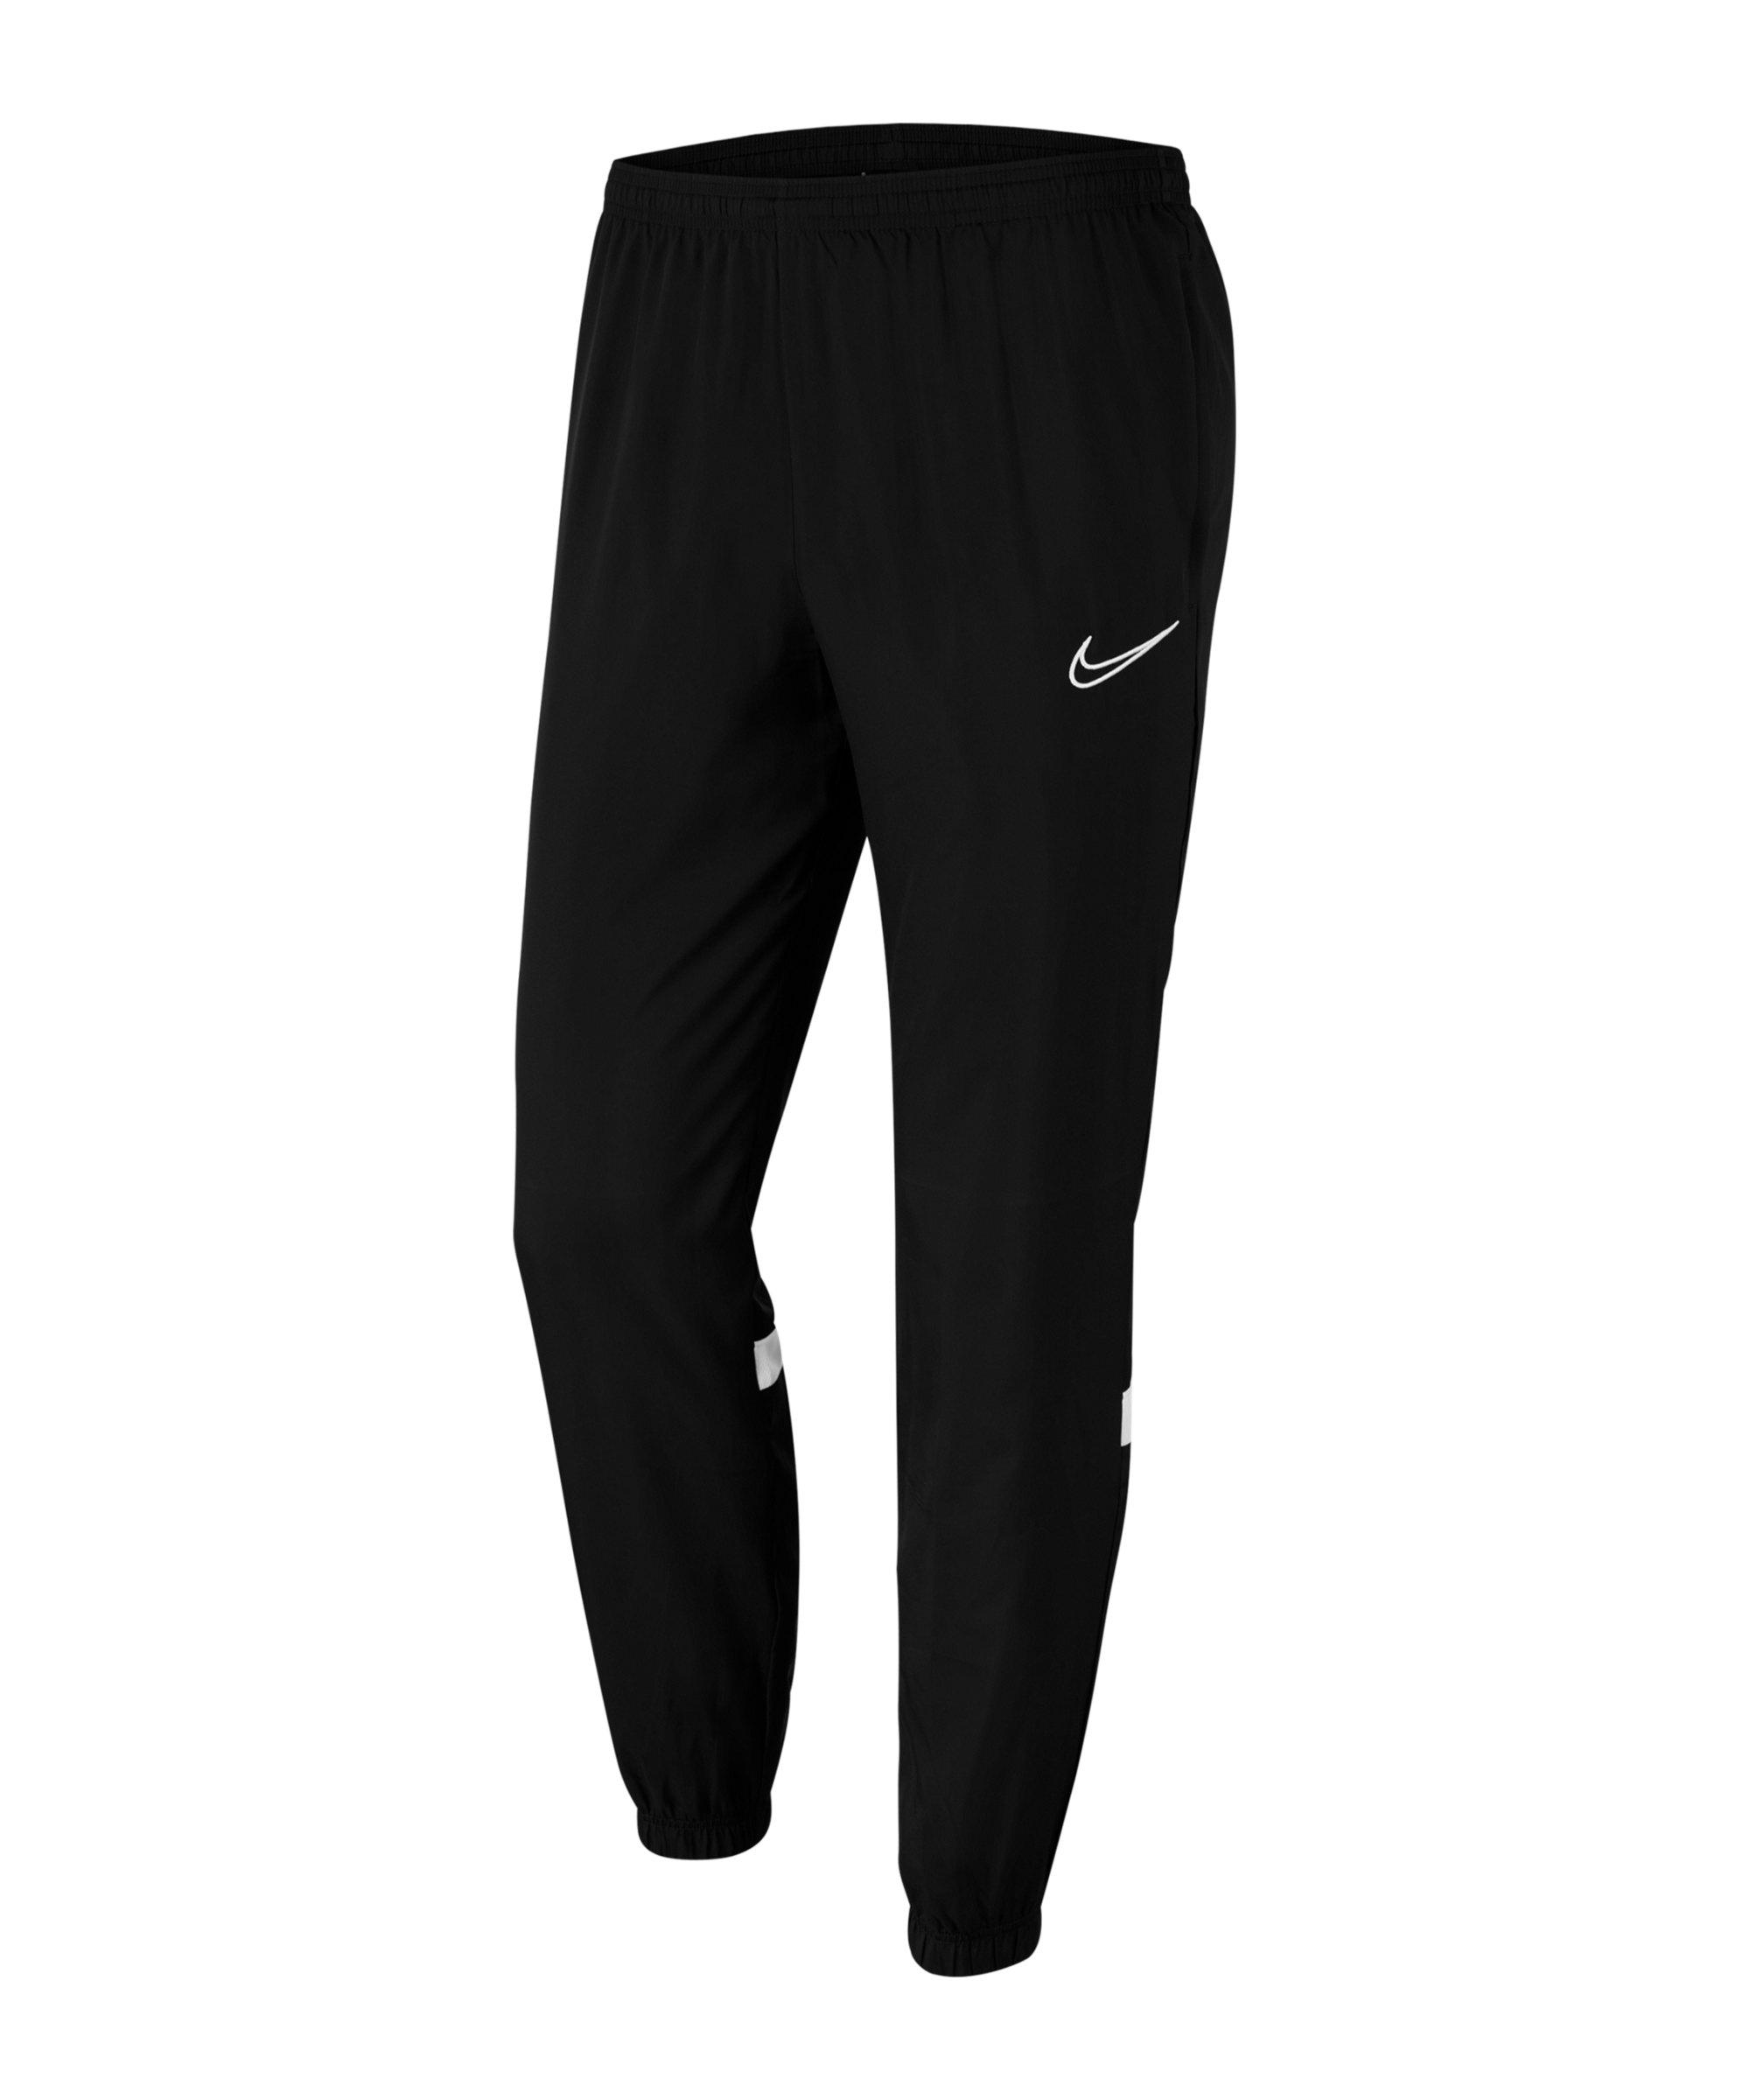 Nike Academy 21 Woven Trainingshose Kids F010 - schwarz